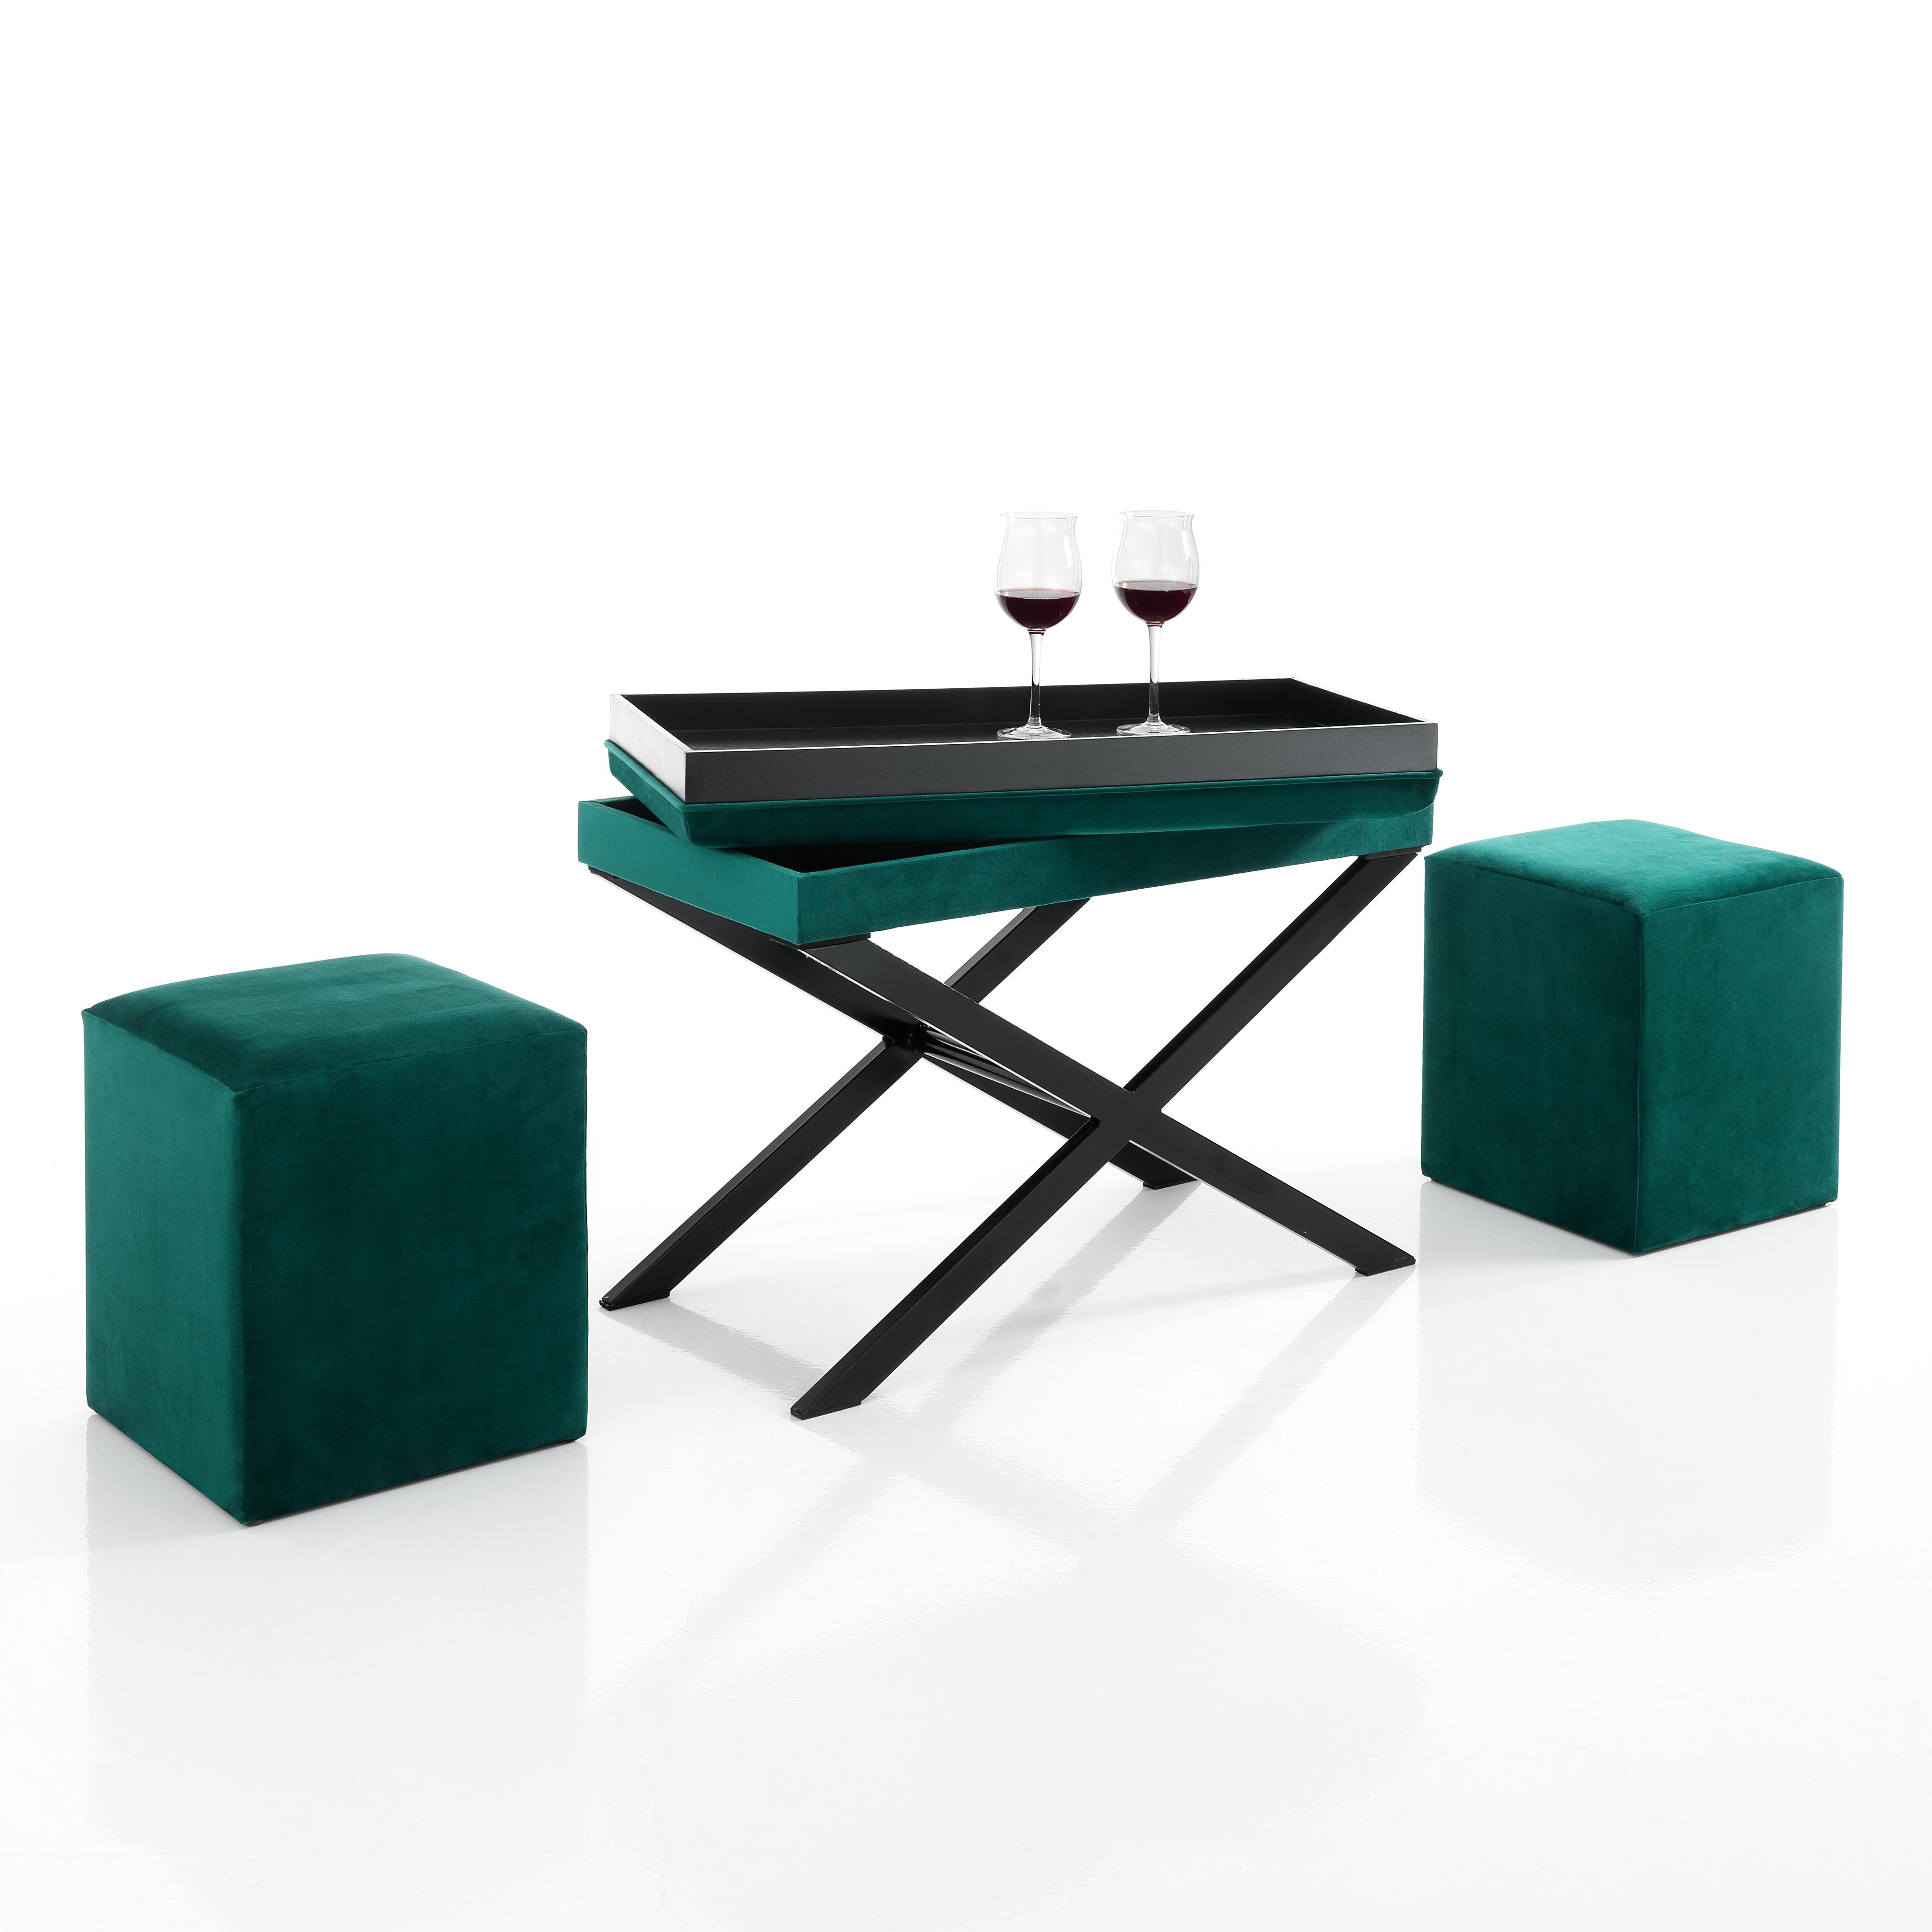 Tavolini : panca / tavolino con 2 pouf KOMODO VERDE PETROLIO